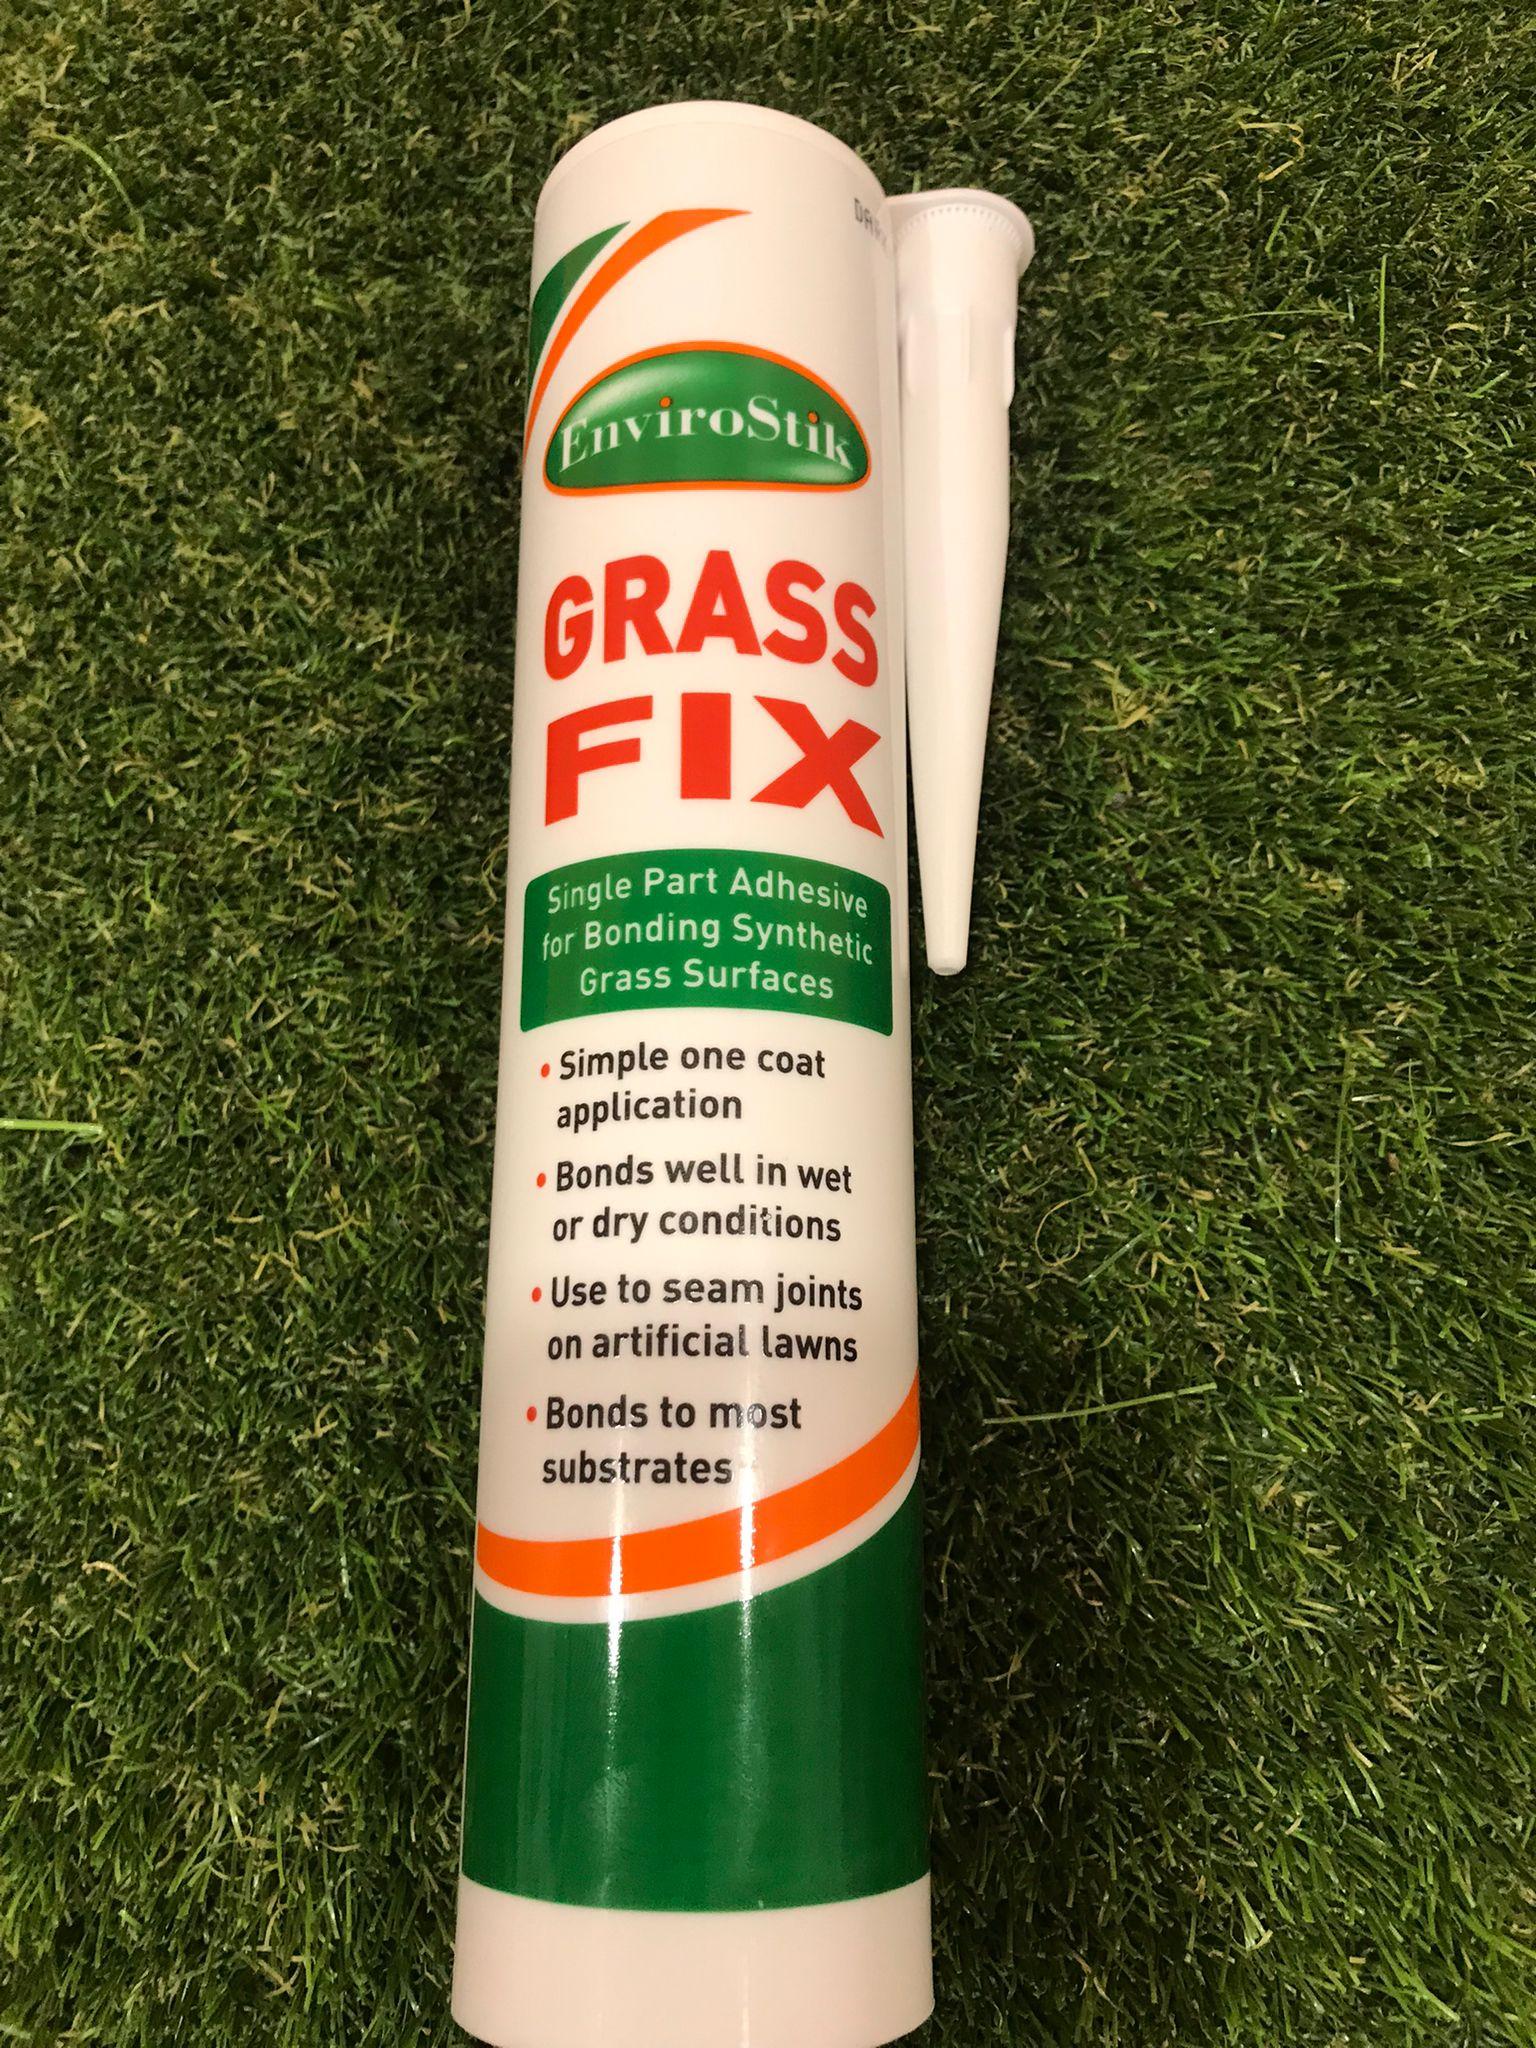 Envirostik Grass Fix 310ml Adhesive